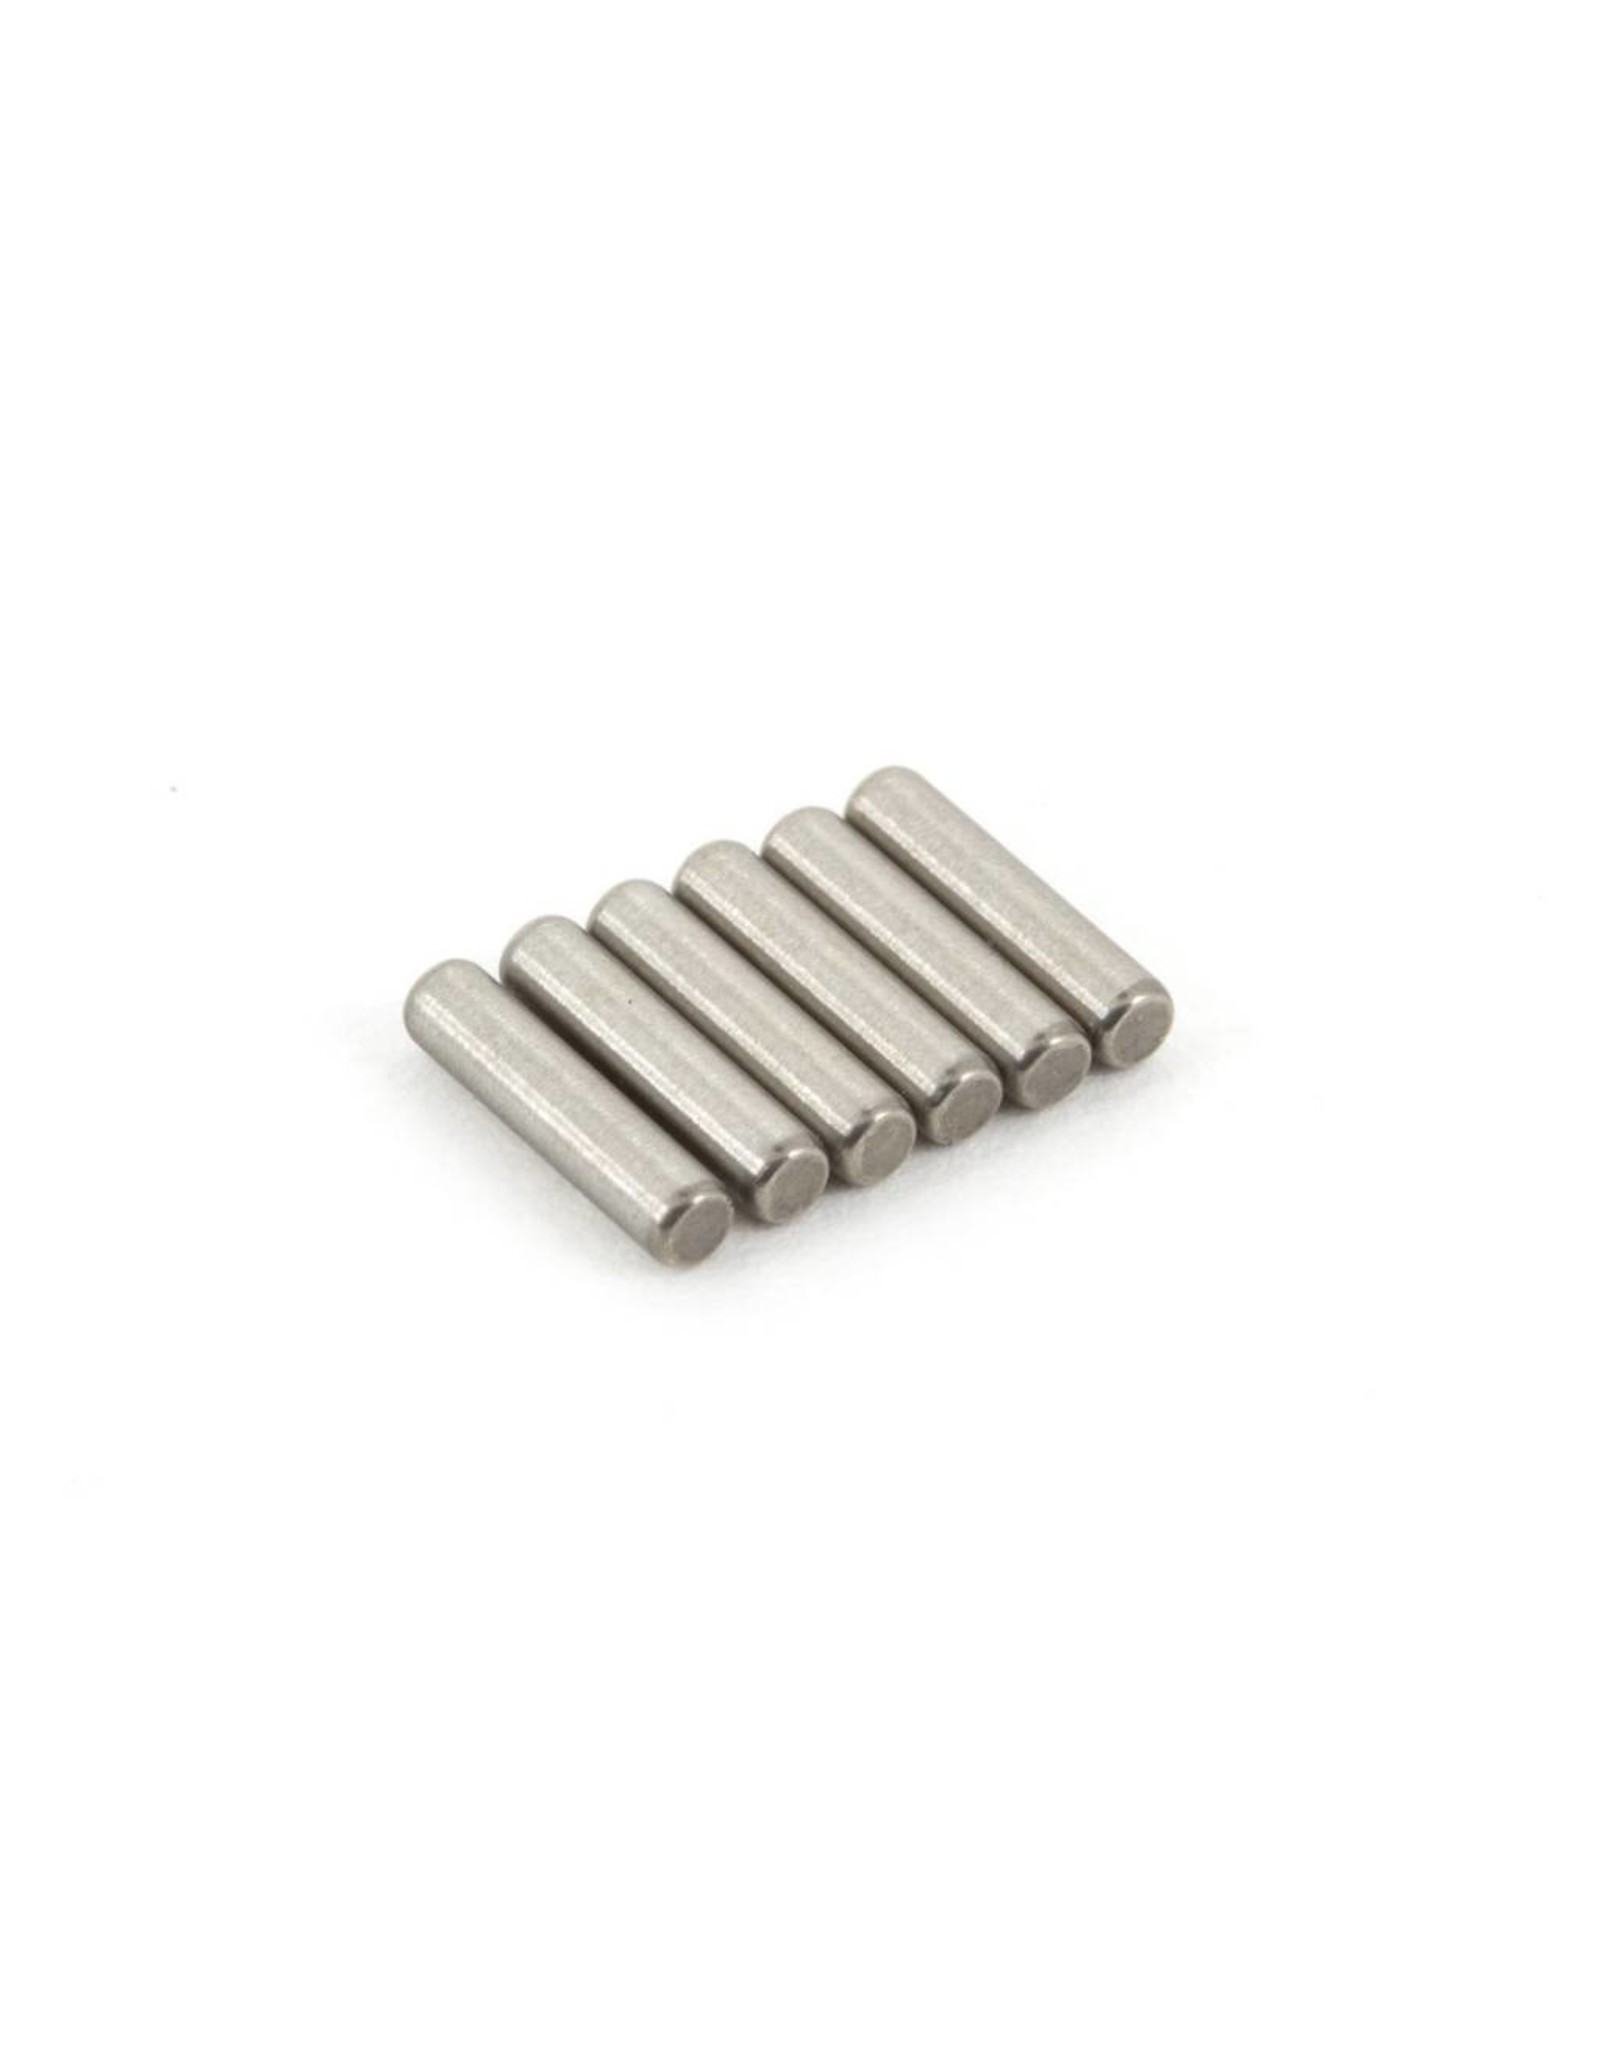 Arrma ARRMA Pin 2.25x9.8mm (6)  (AR310440)